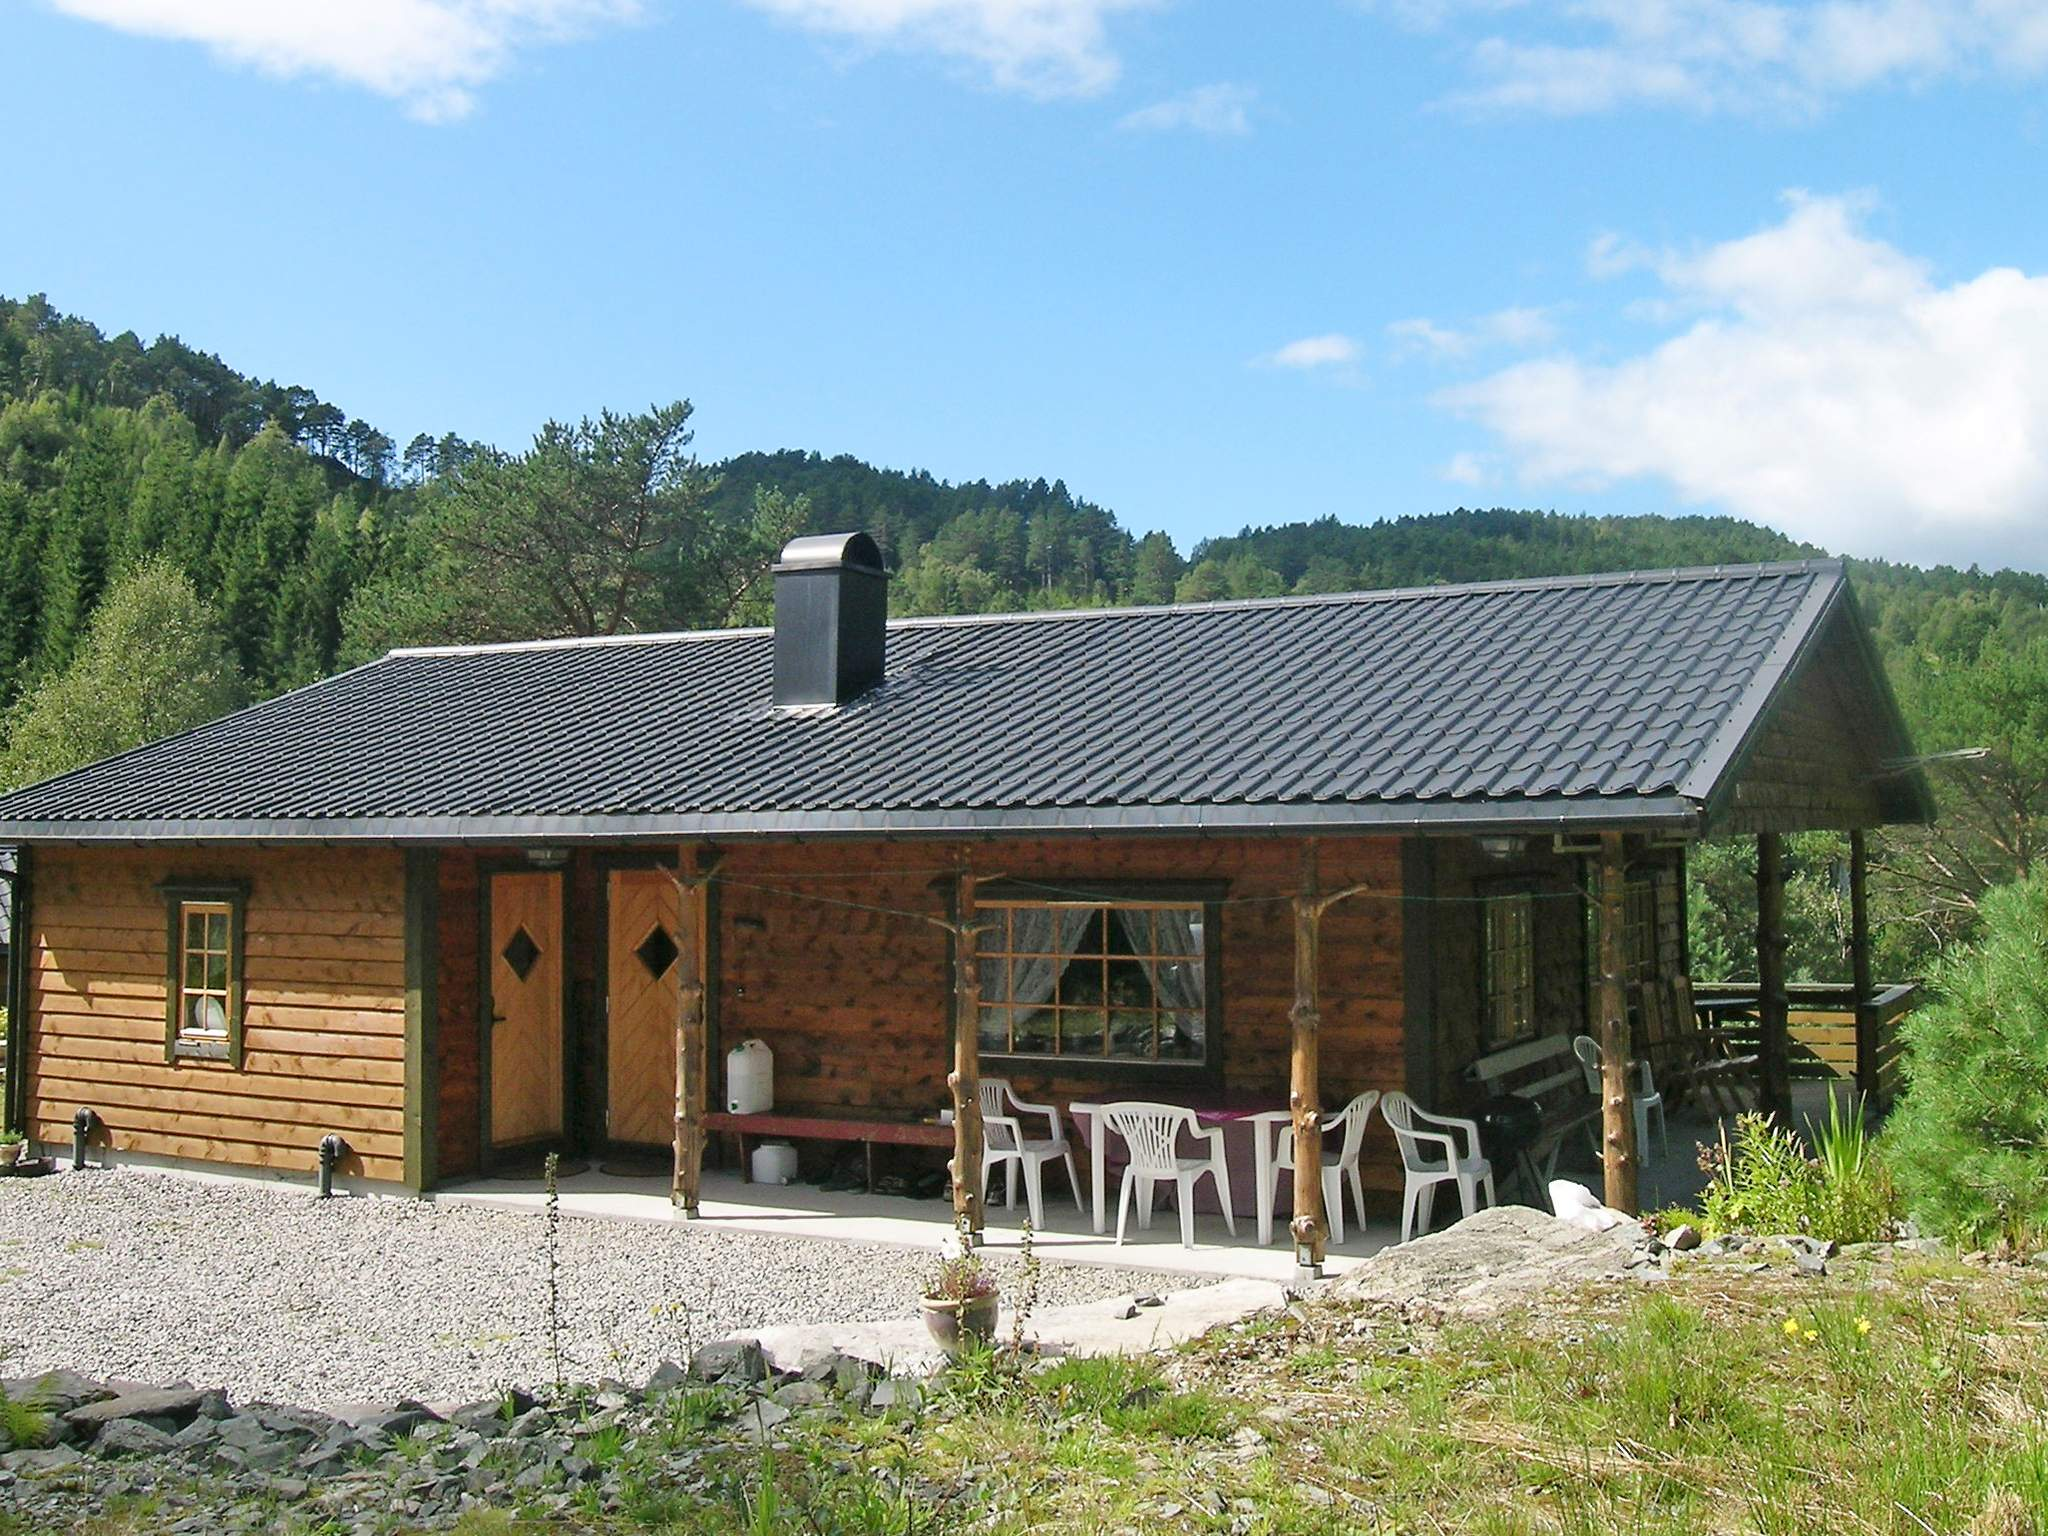 Ferienhaus Helle (82342), Naustdal, Sognefjord - Nordfjord, Westnorwegen, Norwegen, Bild 1